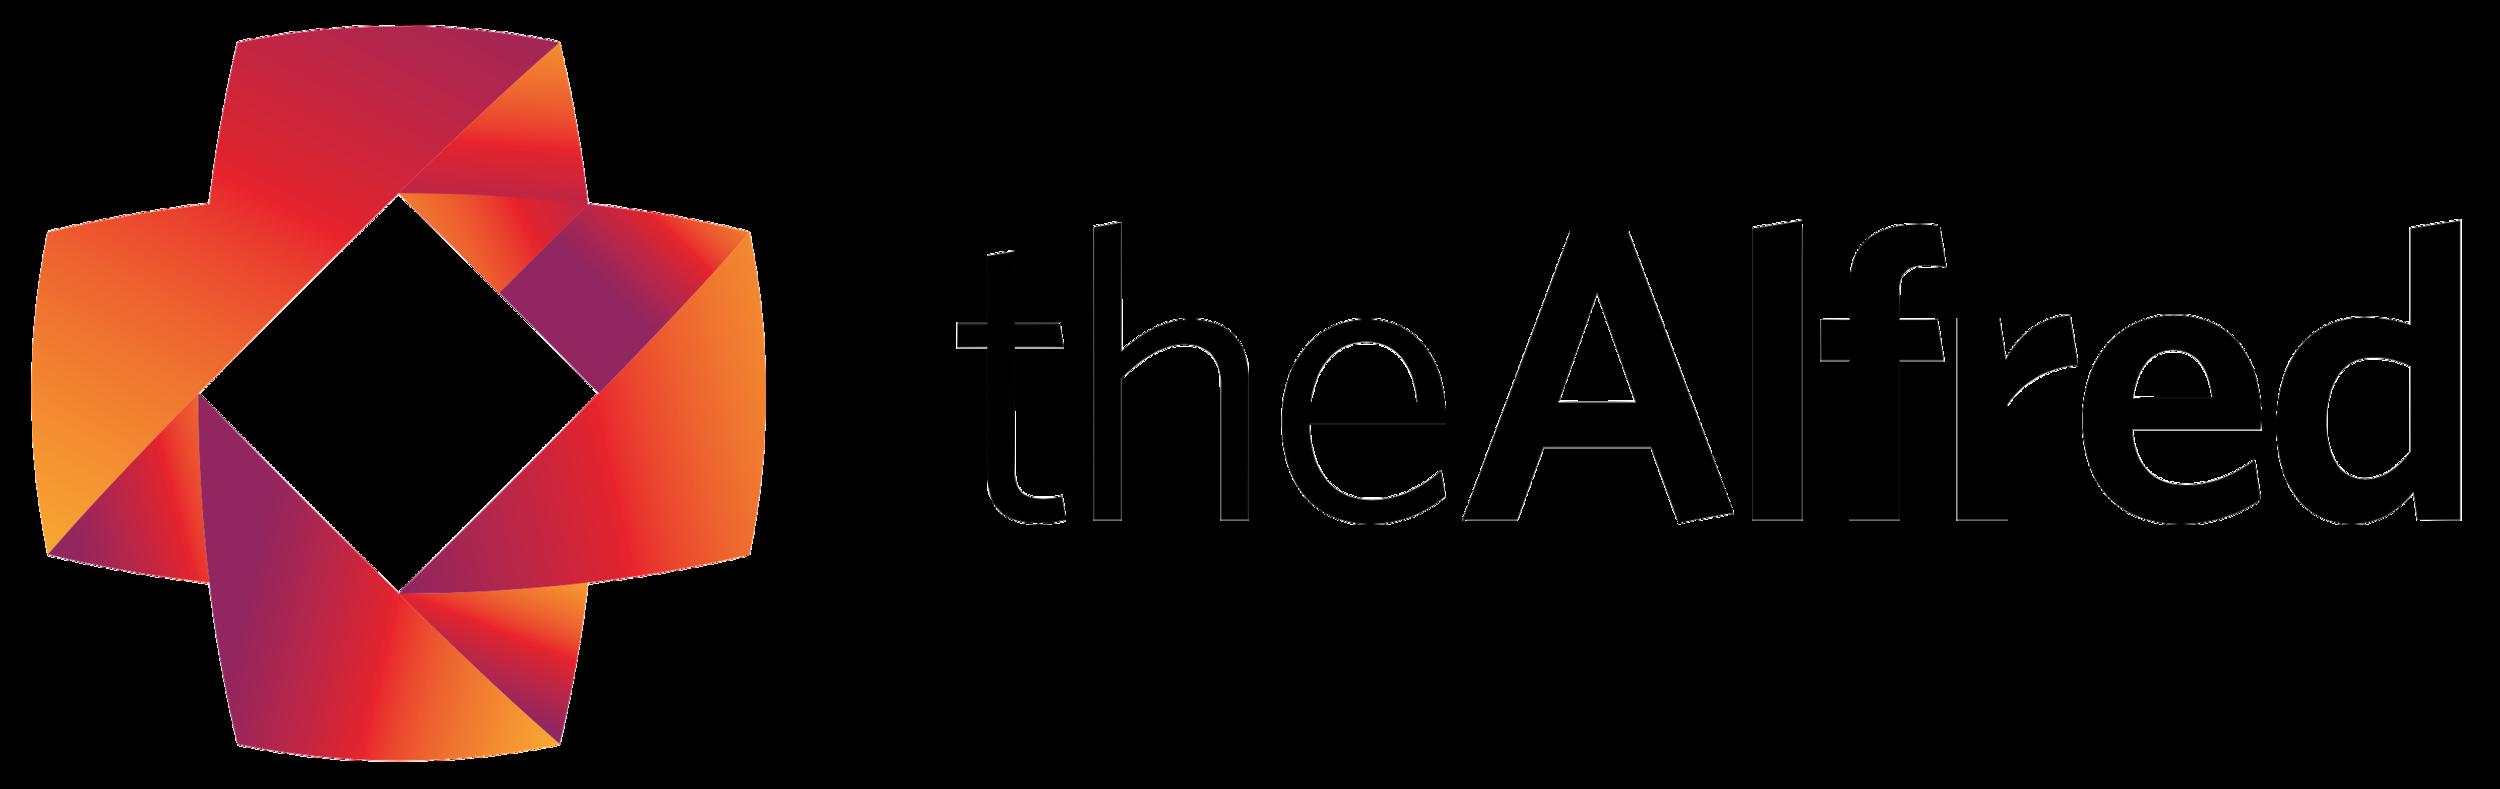 Alfred horizontal logo.png